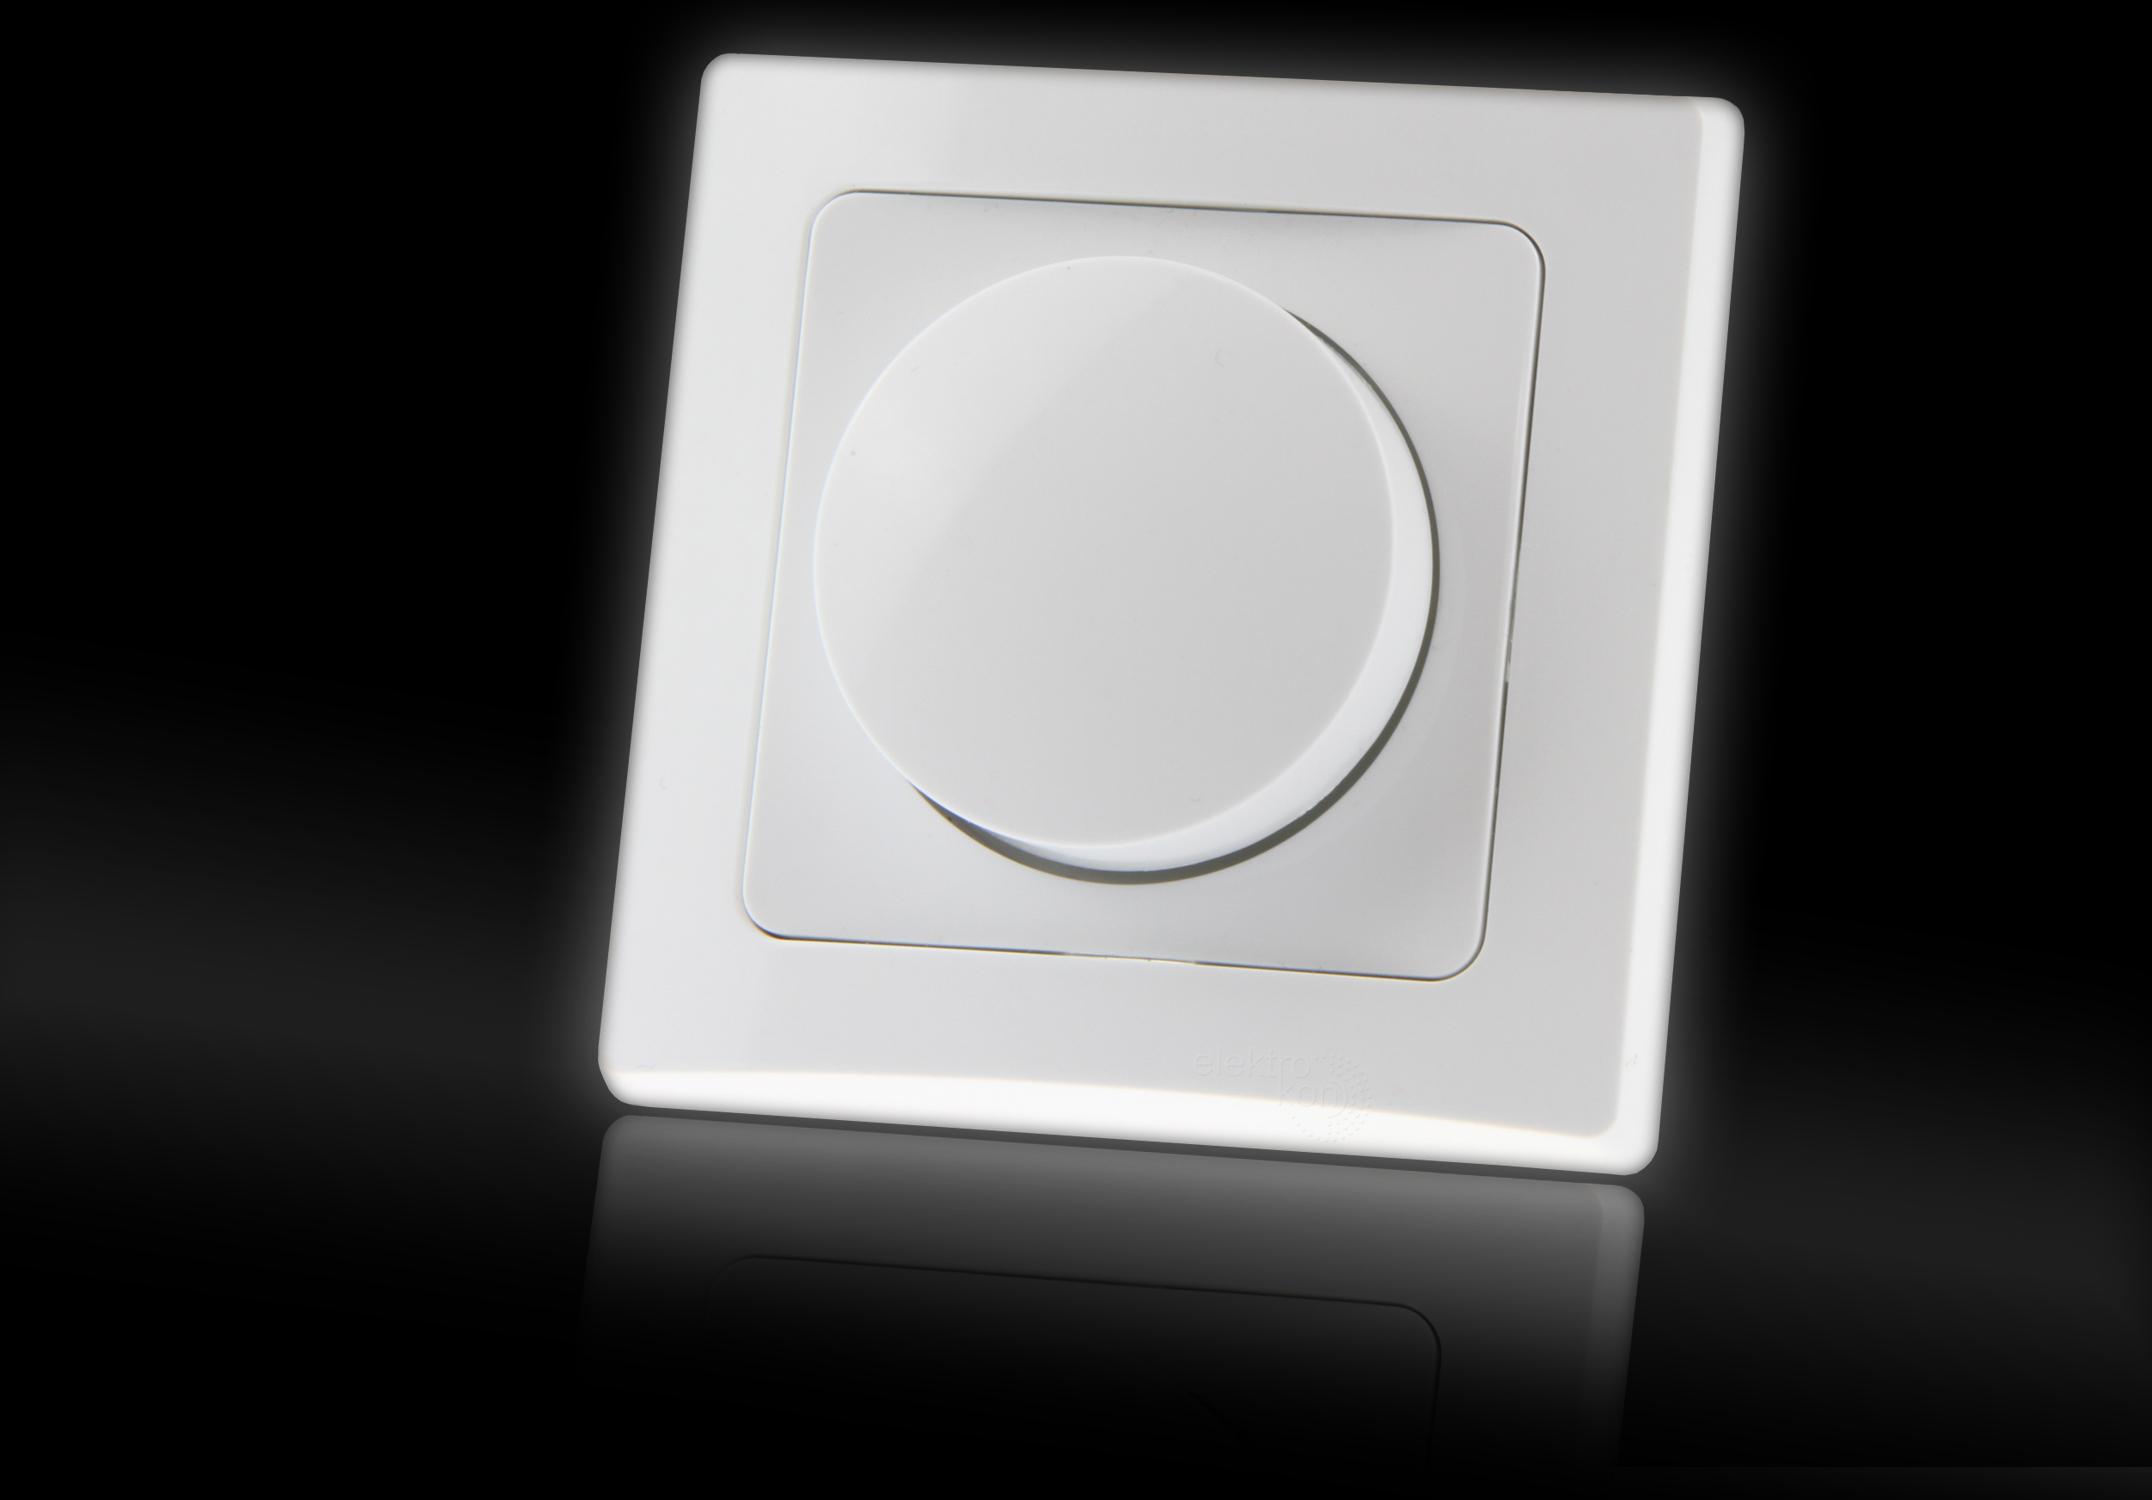 led dreh dimmer schalter f r elektronische trafos 230v 20 300w lampen gu10 up inkl rahmen. Black Bedroom Furniture Sets. Home Design Ideas